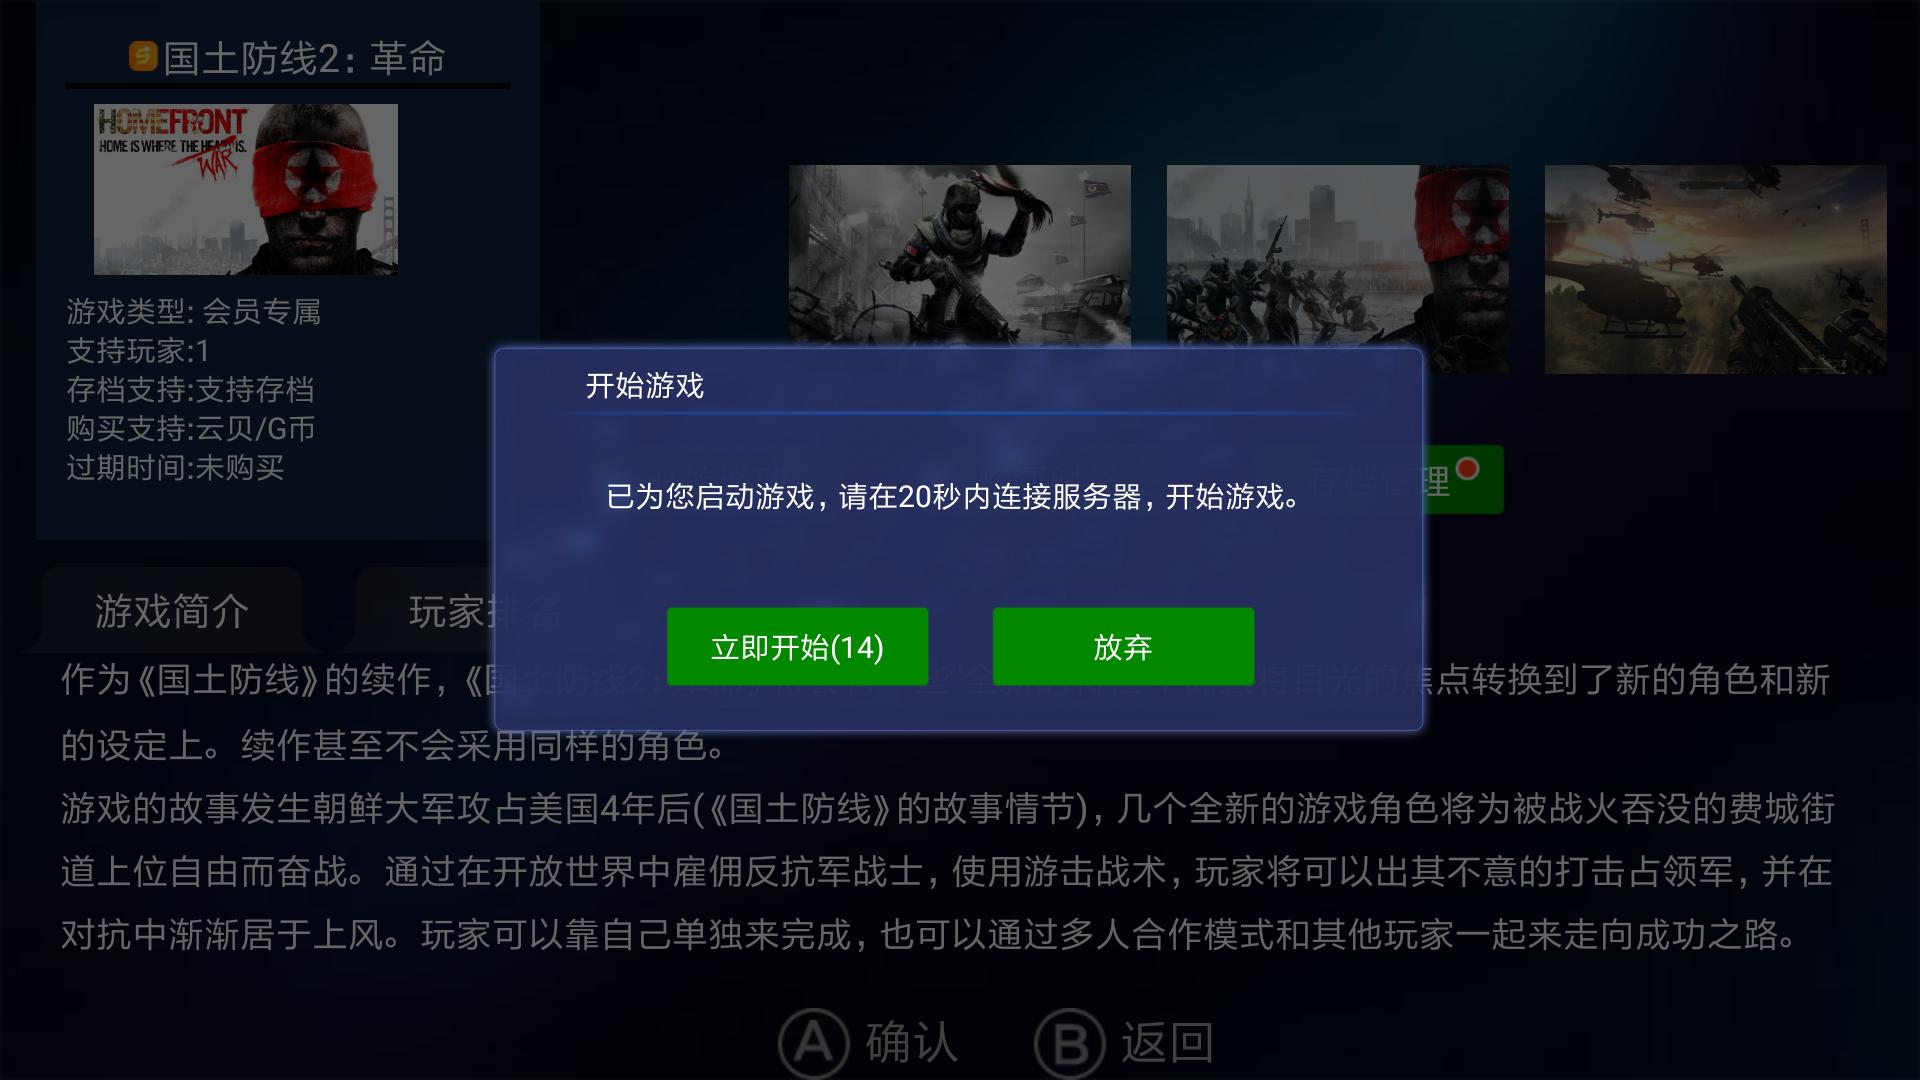 Download Hola Vpn Apk Android